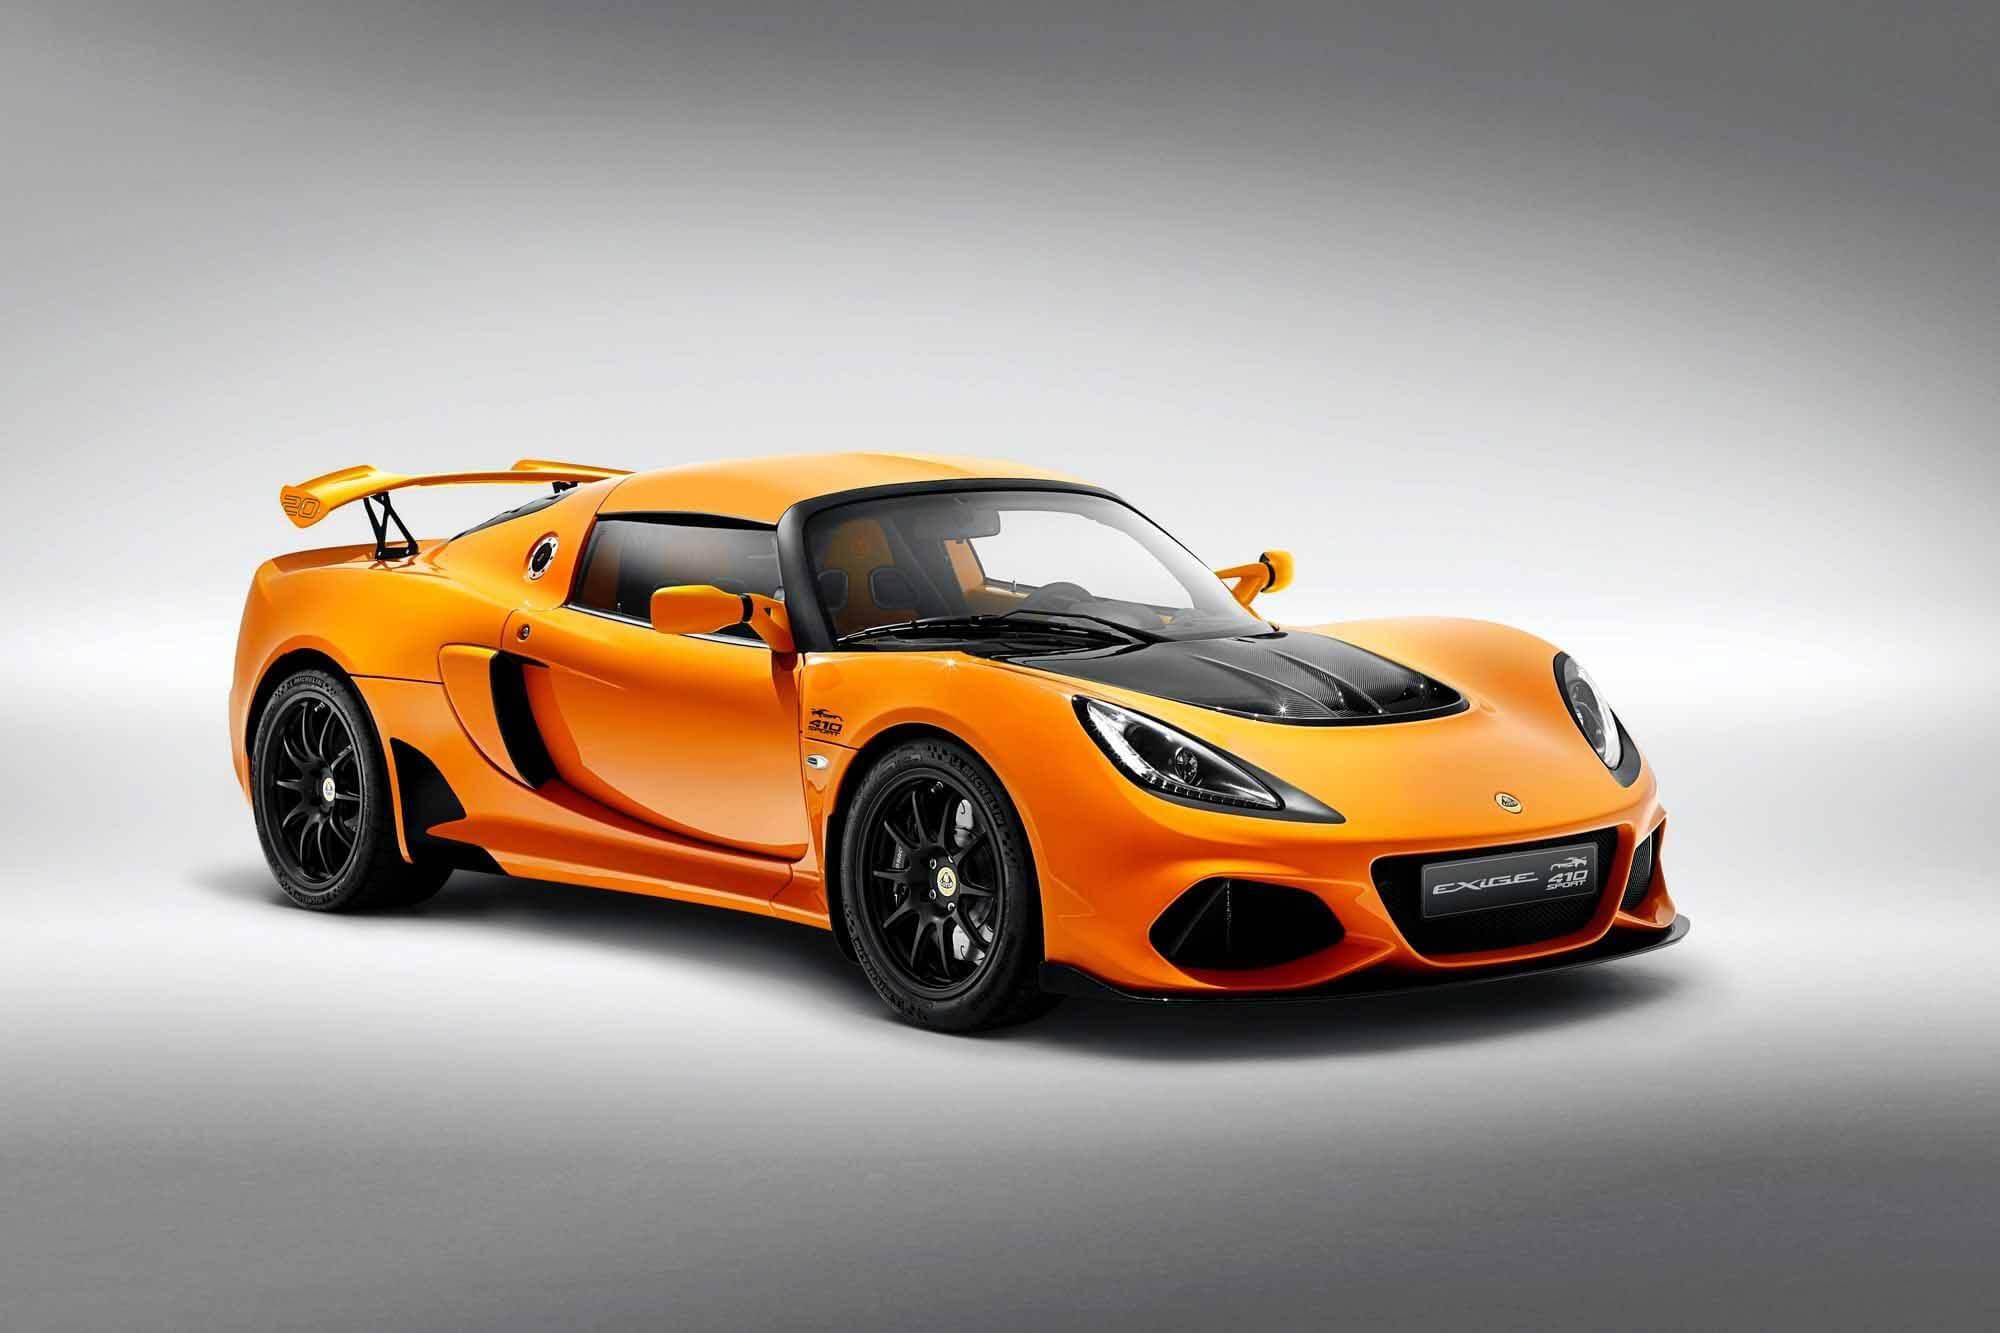 Веселая «корка»: Lotus представила юбилей Exige для гурманов